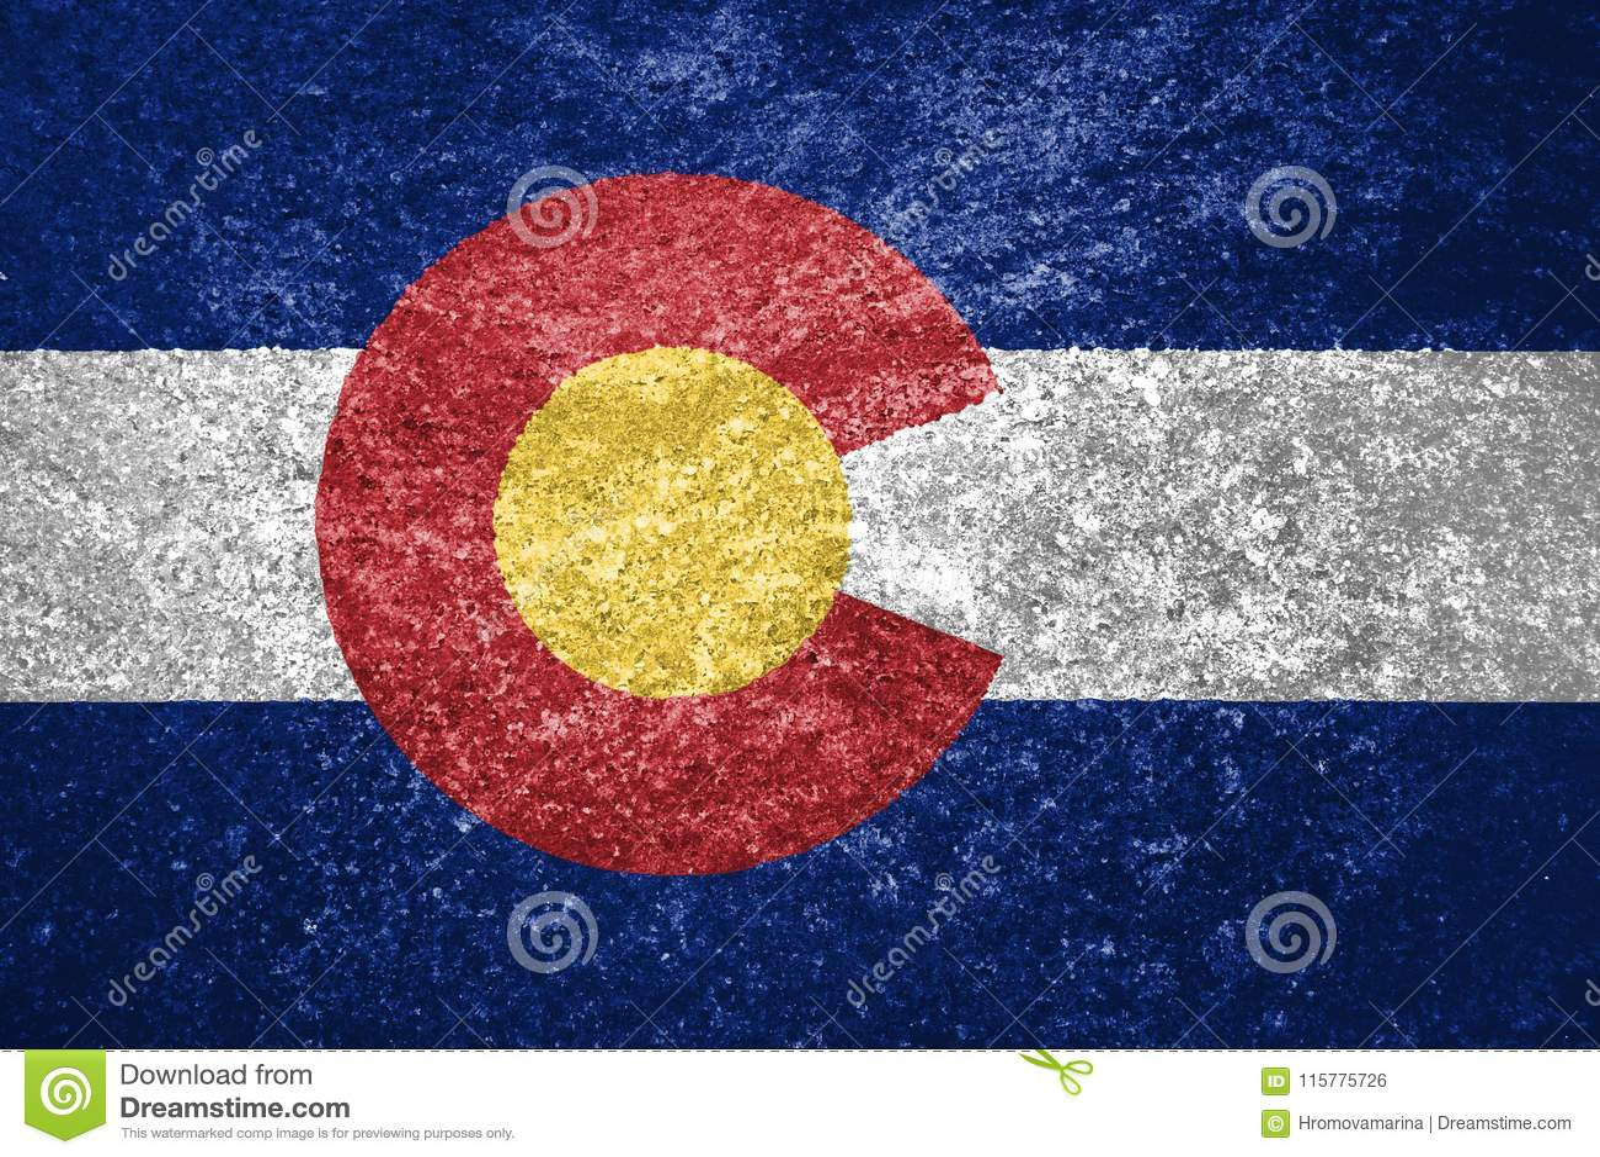 Texture of Colorado flag